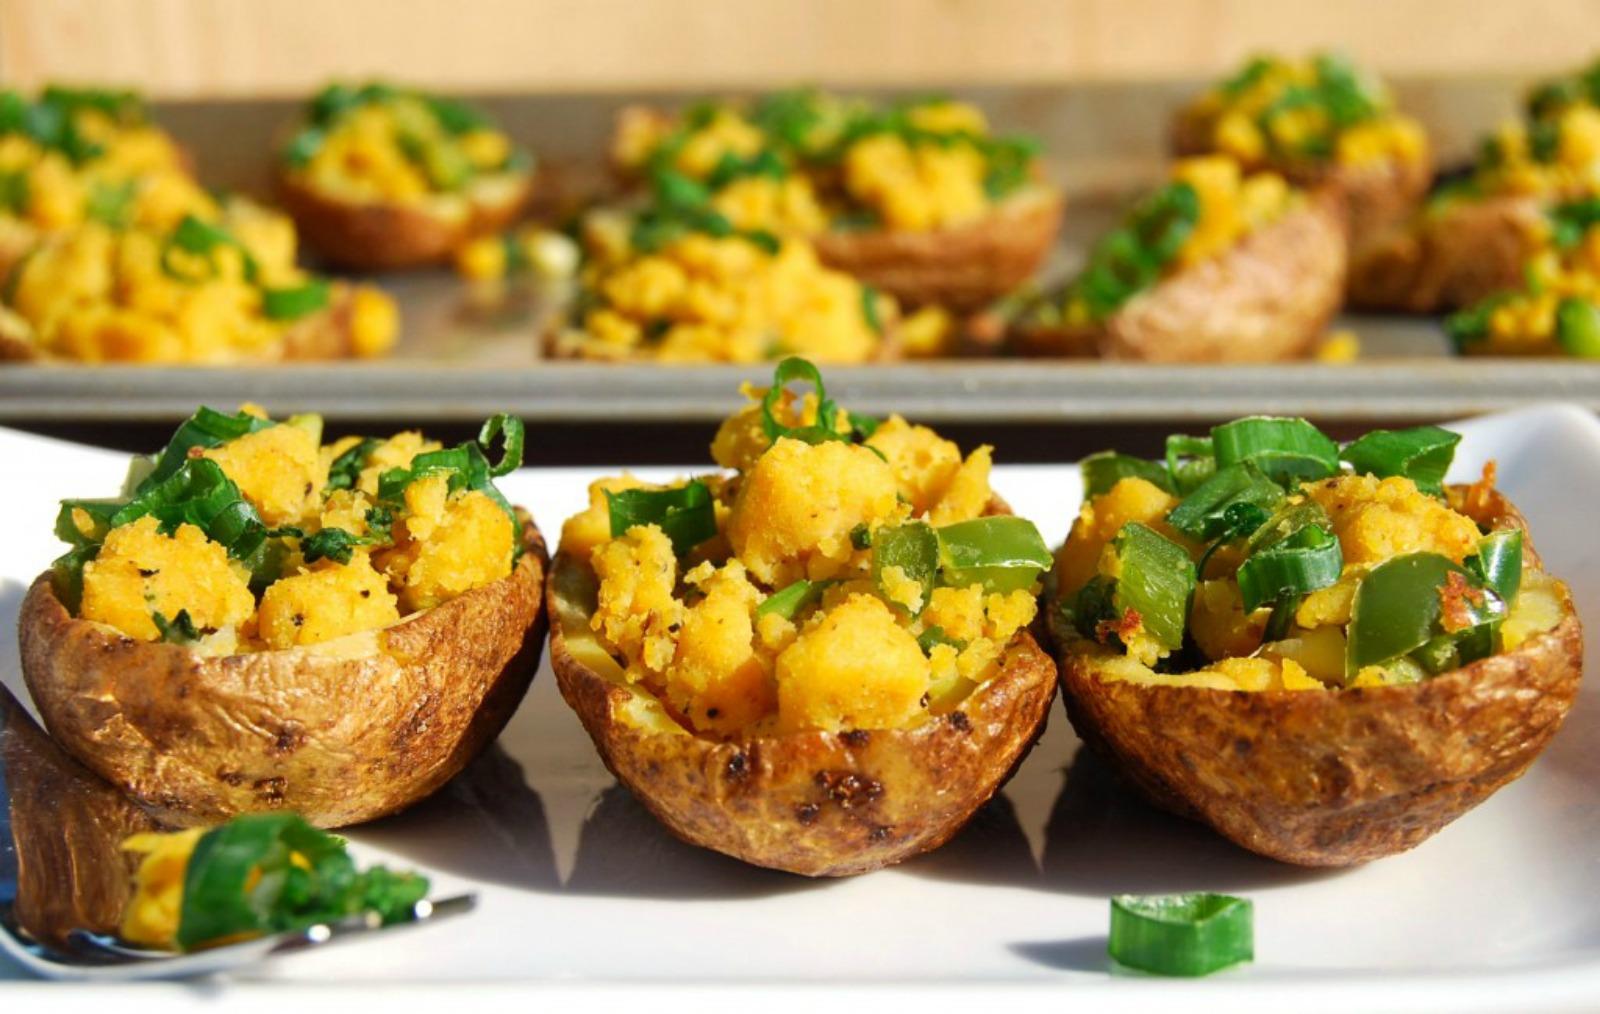 8 Ways to Make Badass Baked Potatoes